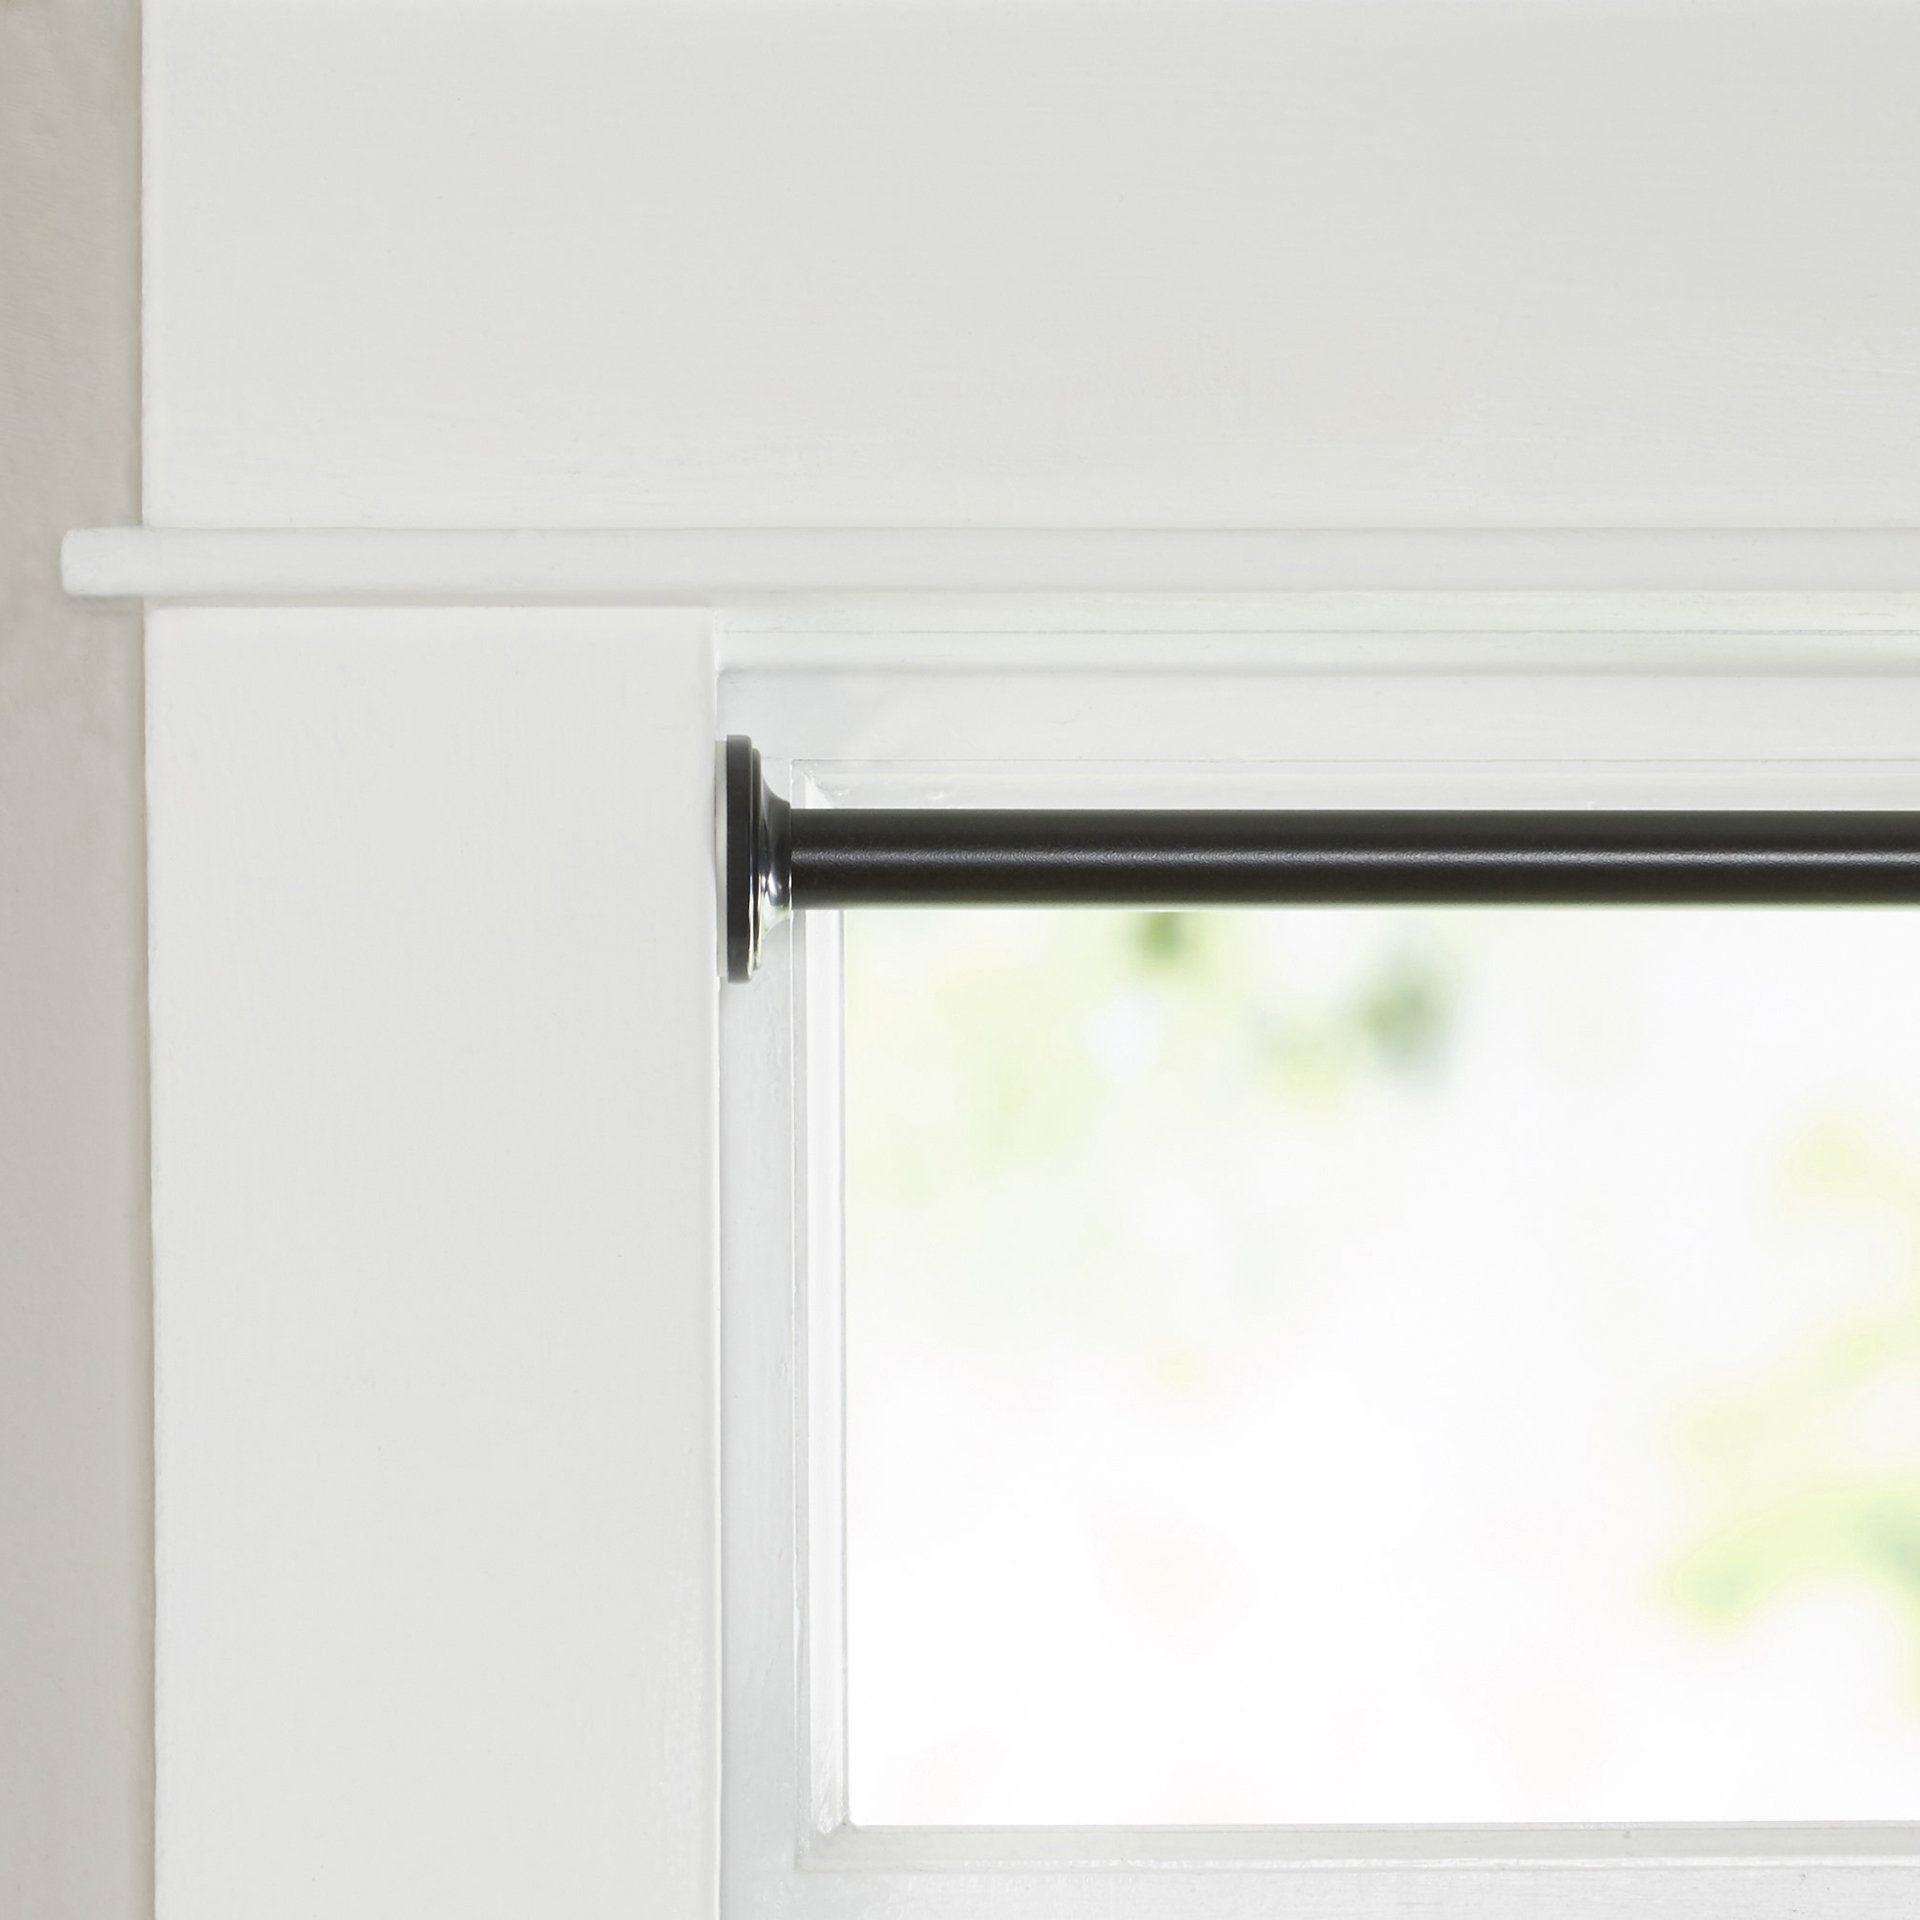 Wayfair Basics Blackout Tension Curtain Rod And Hardware Set